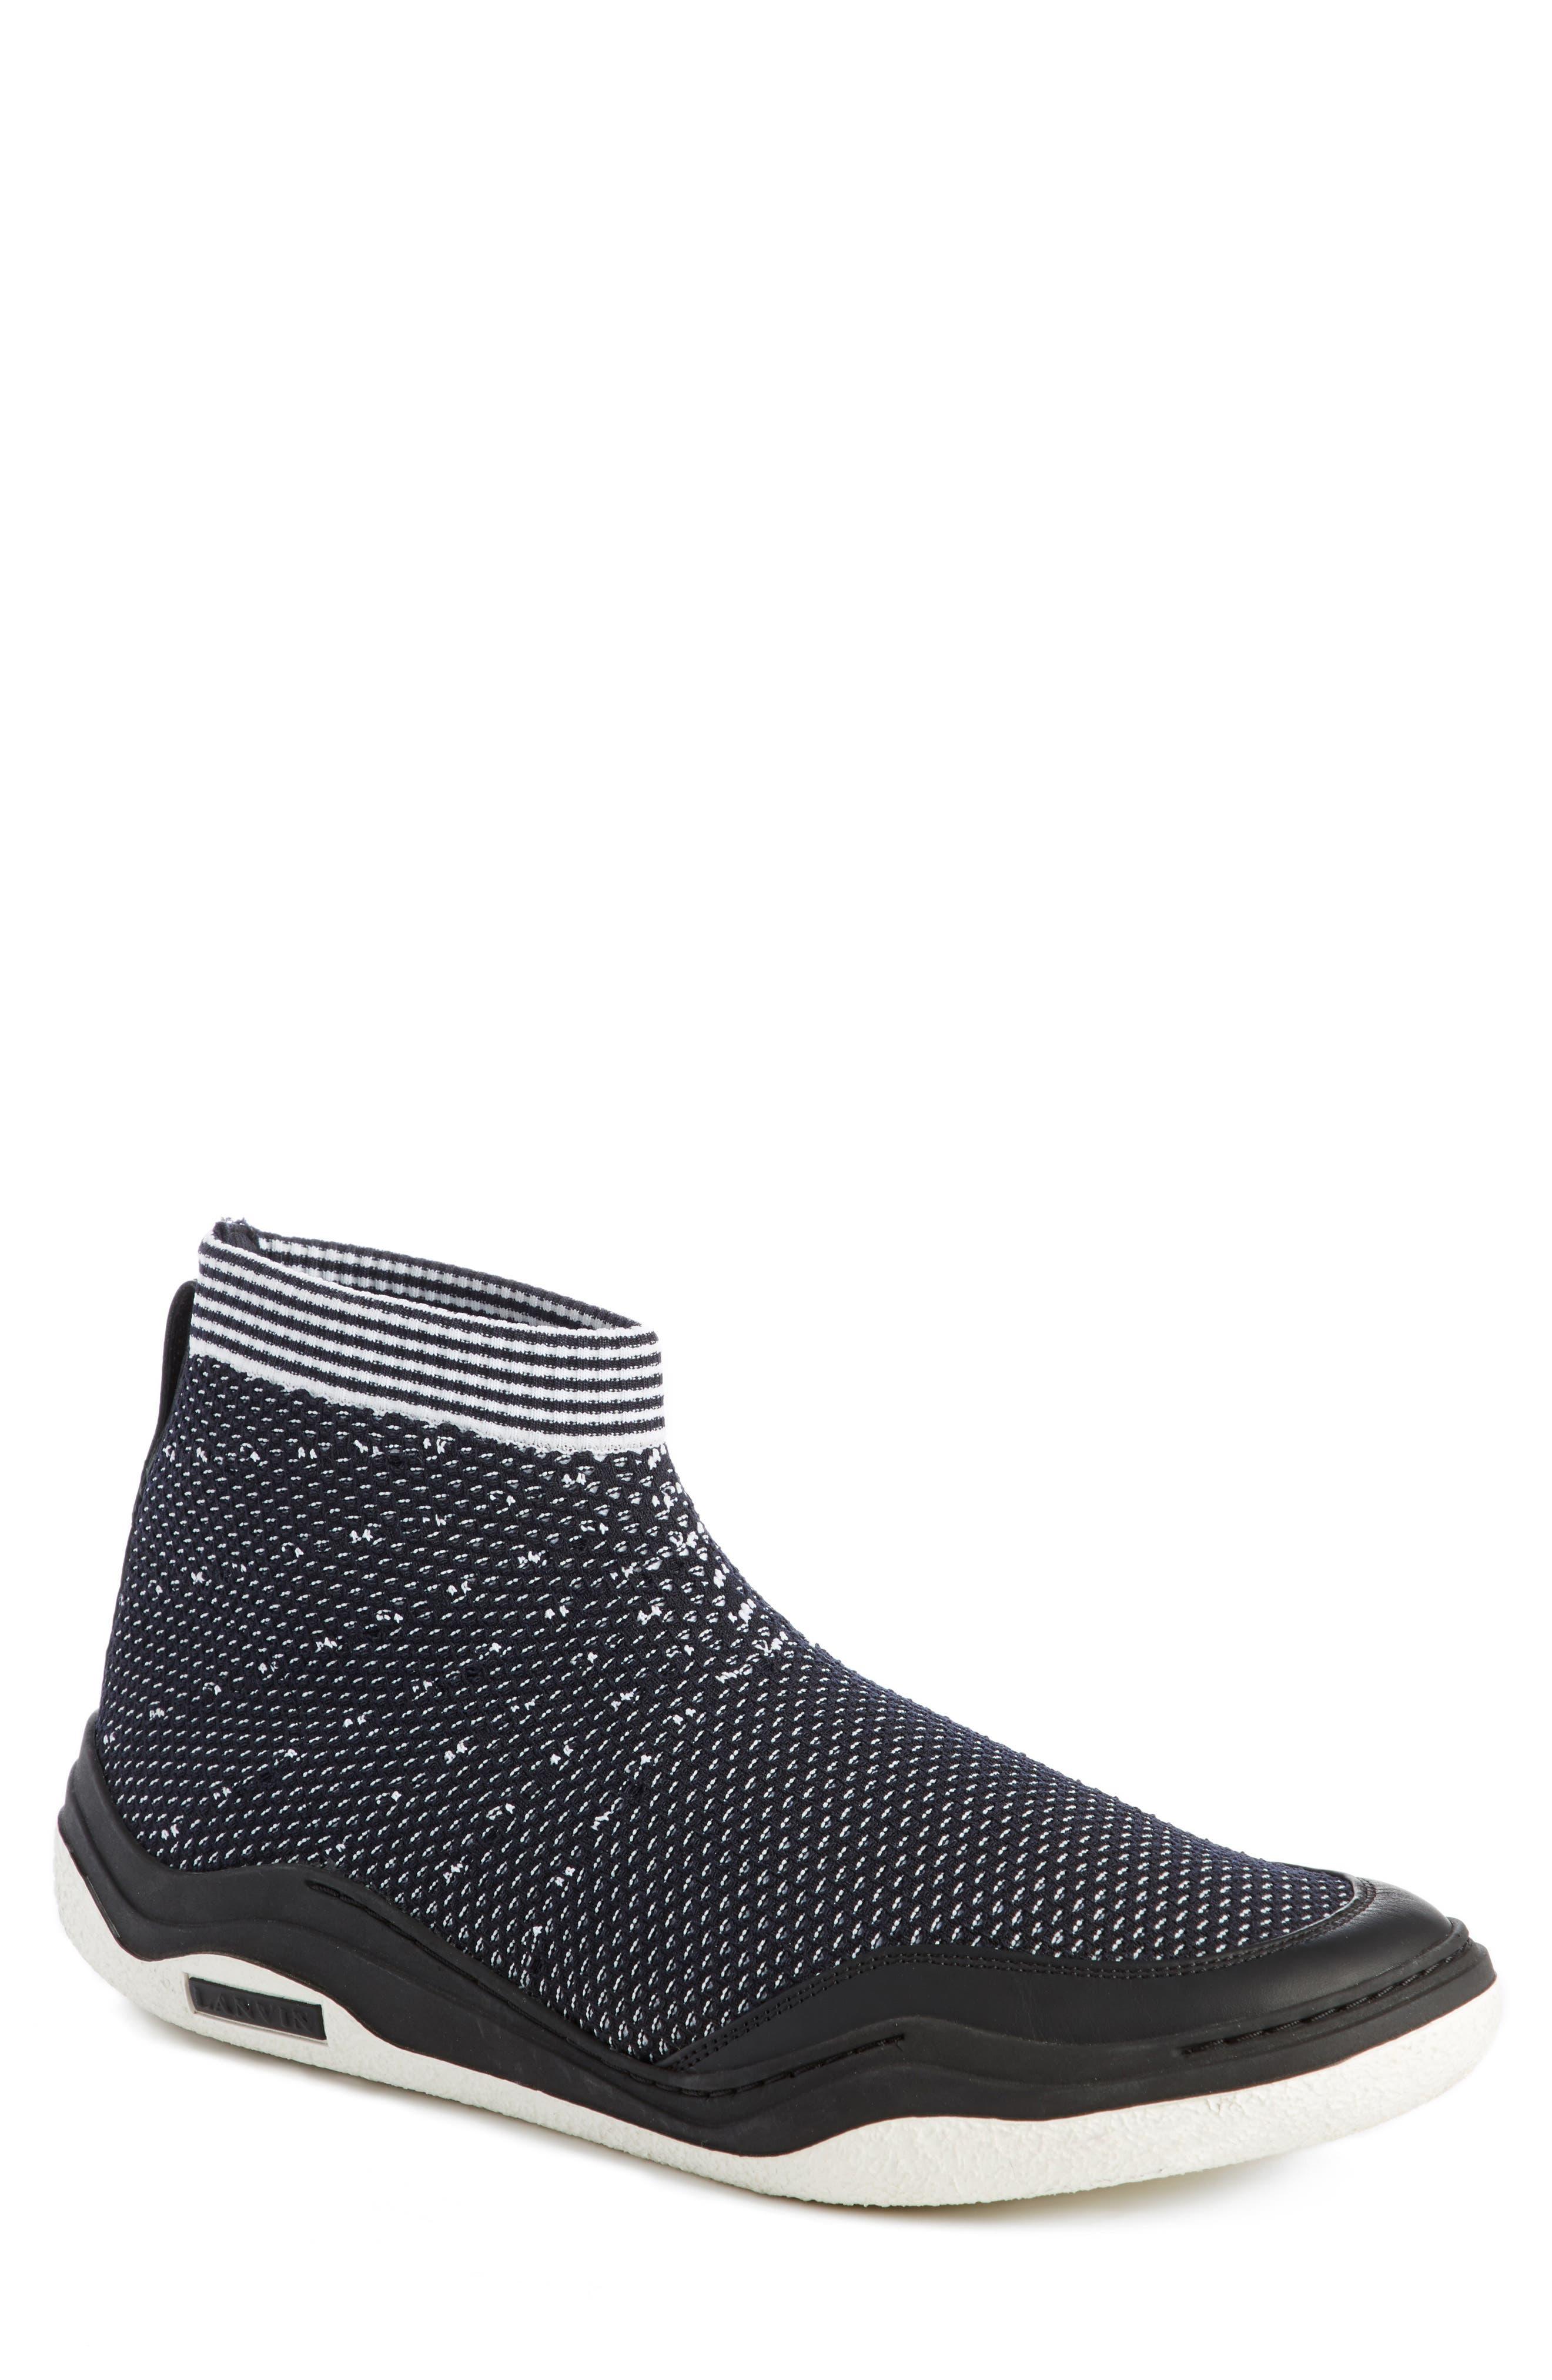 Main Image - Lanvin Knit Sneaker (Men)